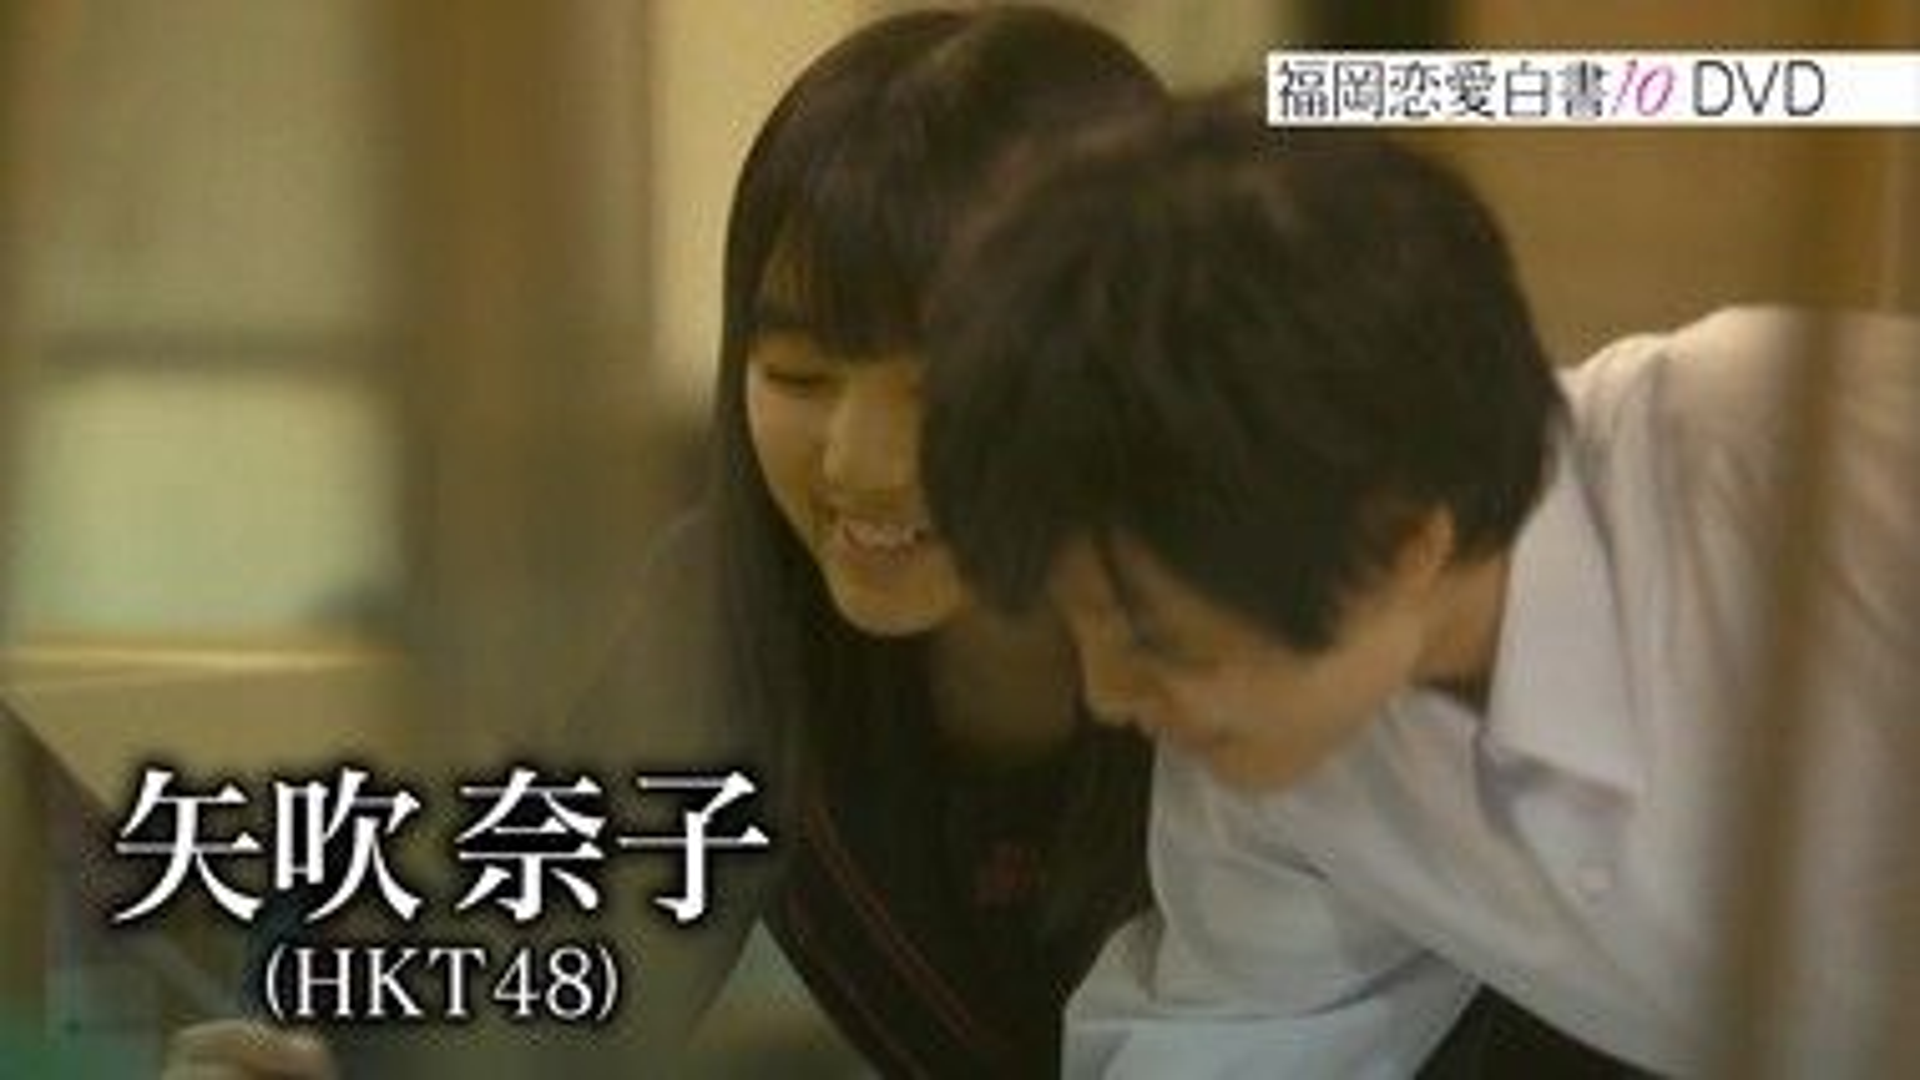 Love Stories from Fukuoka Episode 10 Trailer: Love Stories From Fukuoka